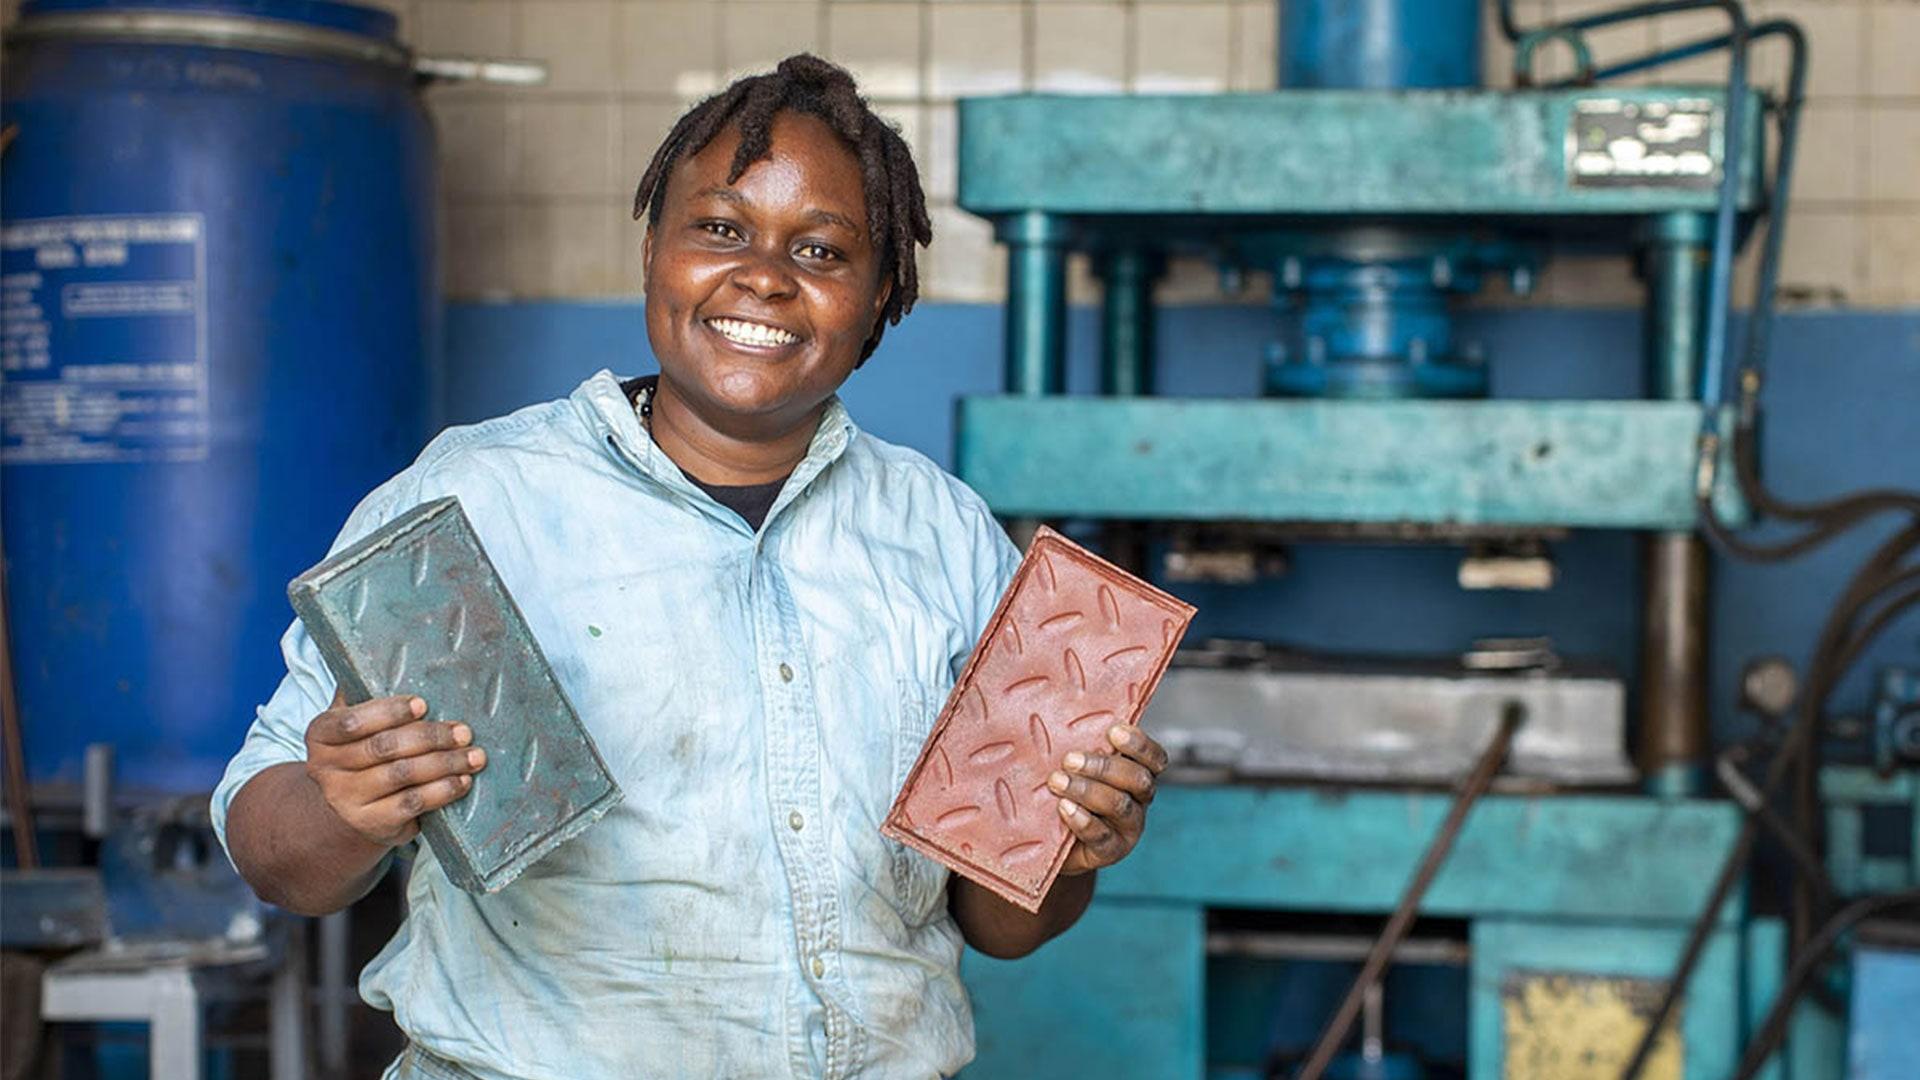 Enterprising Kenyan Engineer Finds An Innovative Solution To Use Plastic Waste